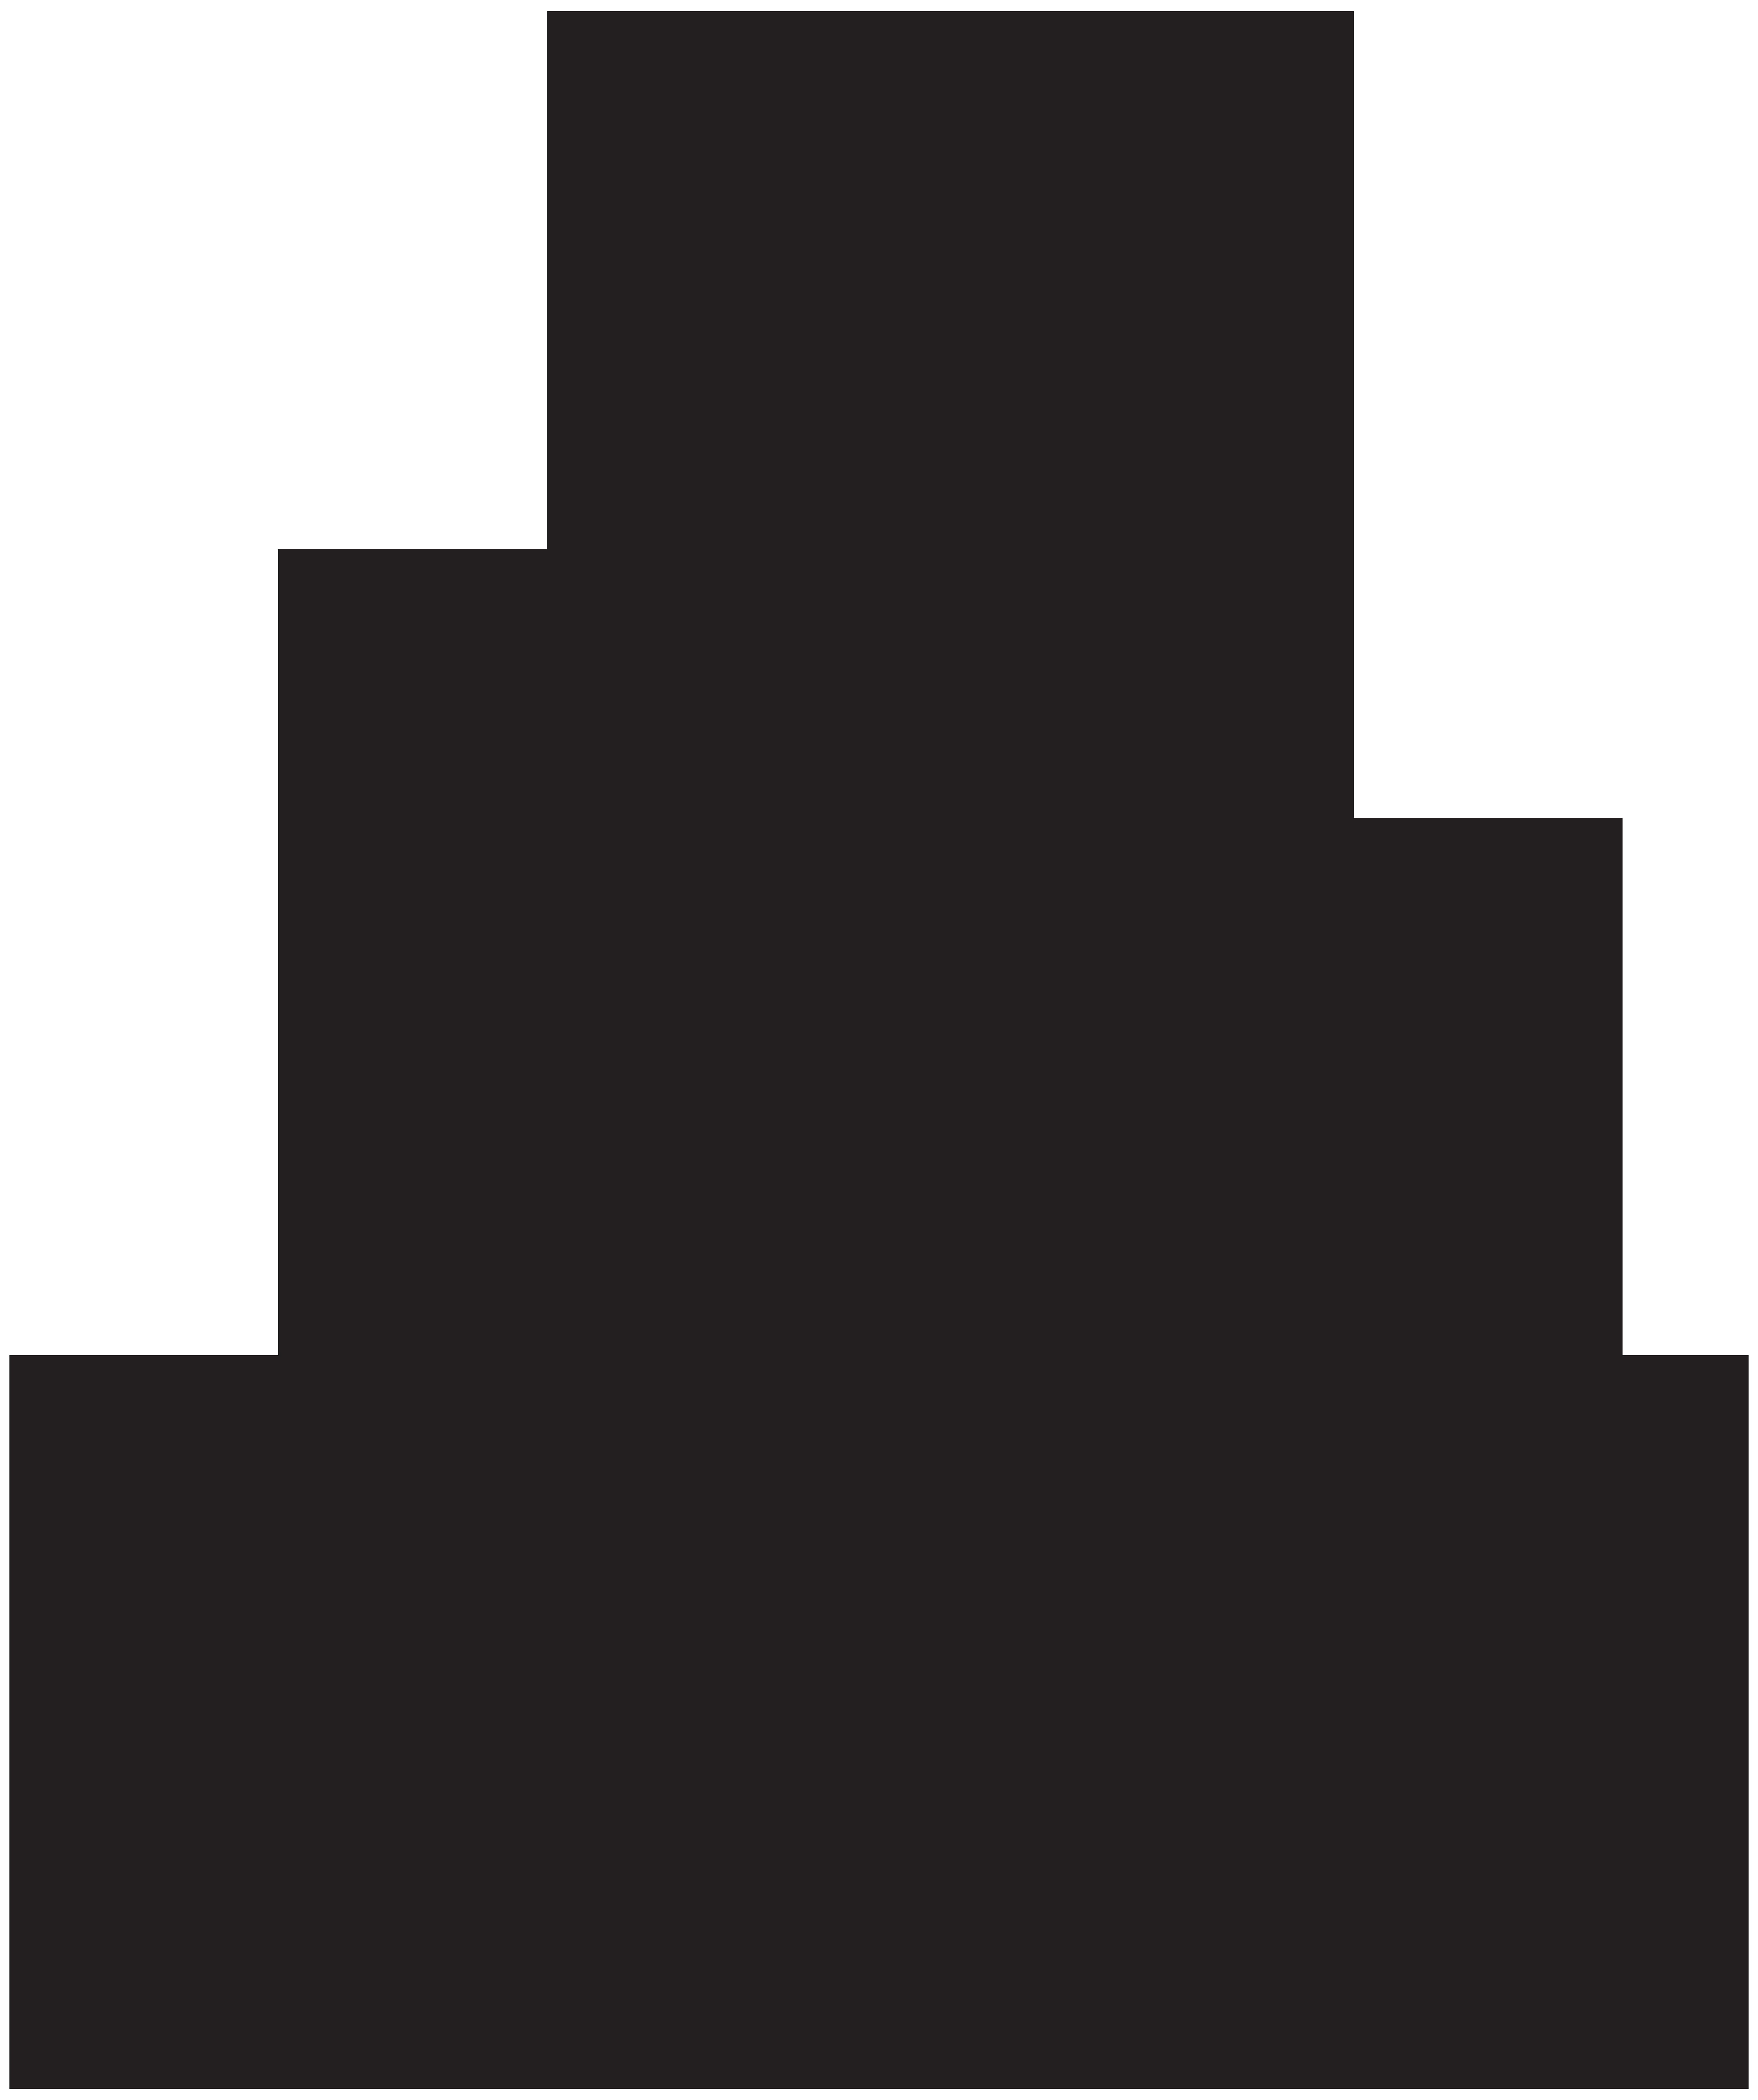 6696x8000 Free Meditating Buddha Silhouette Clipart